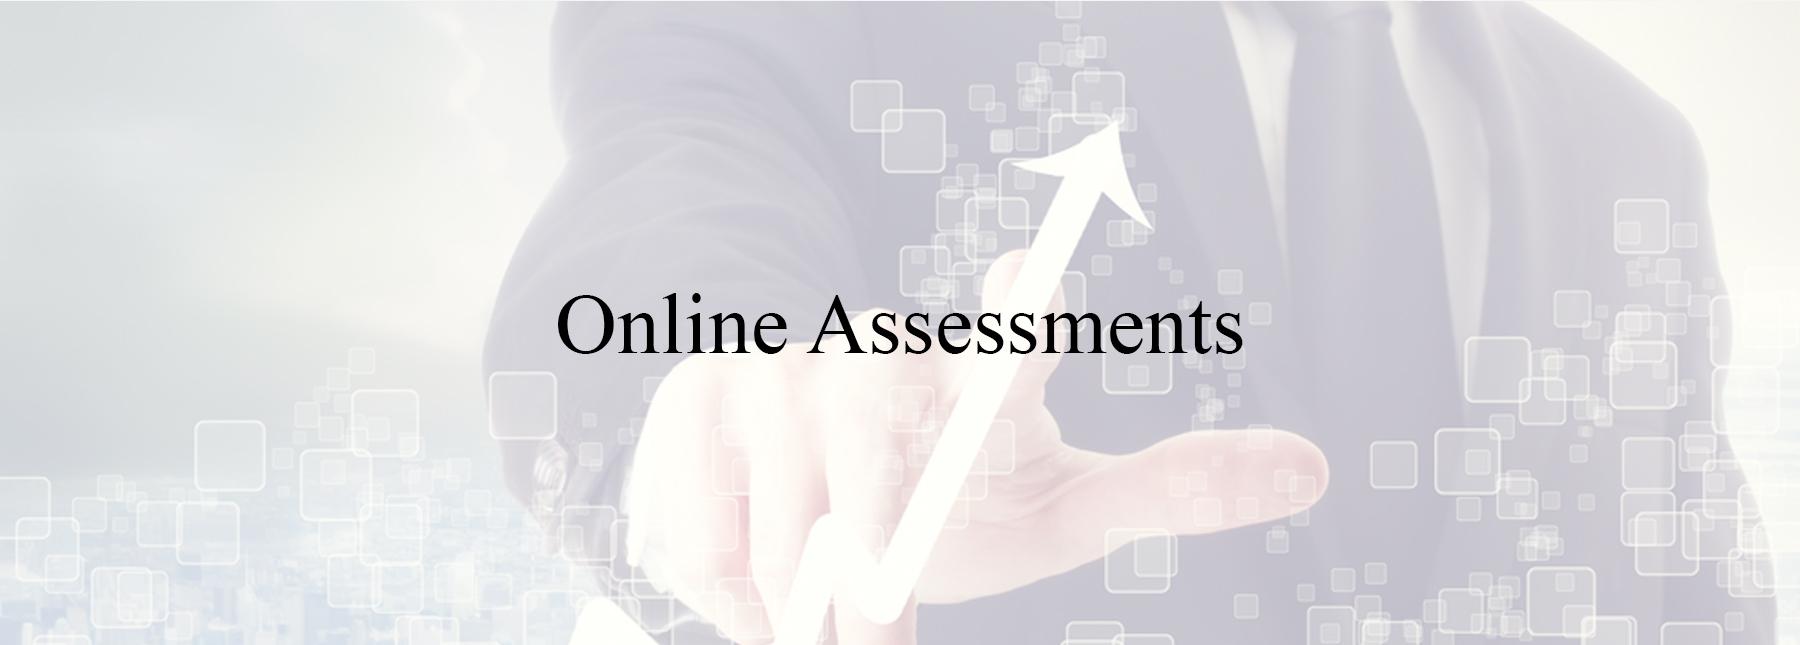 Online Assessments